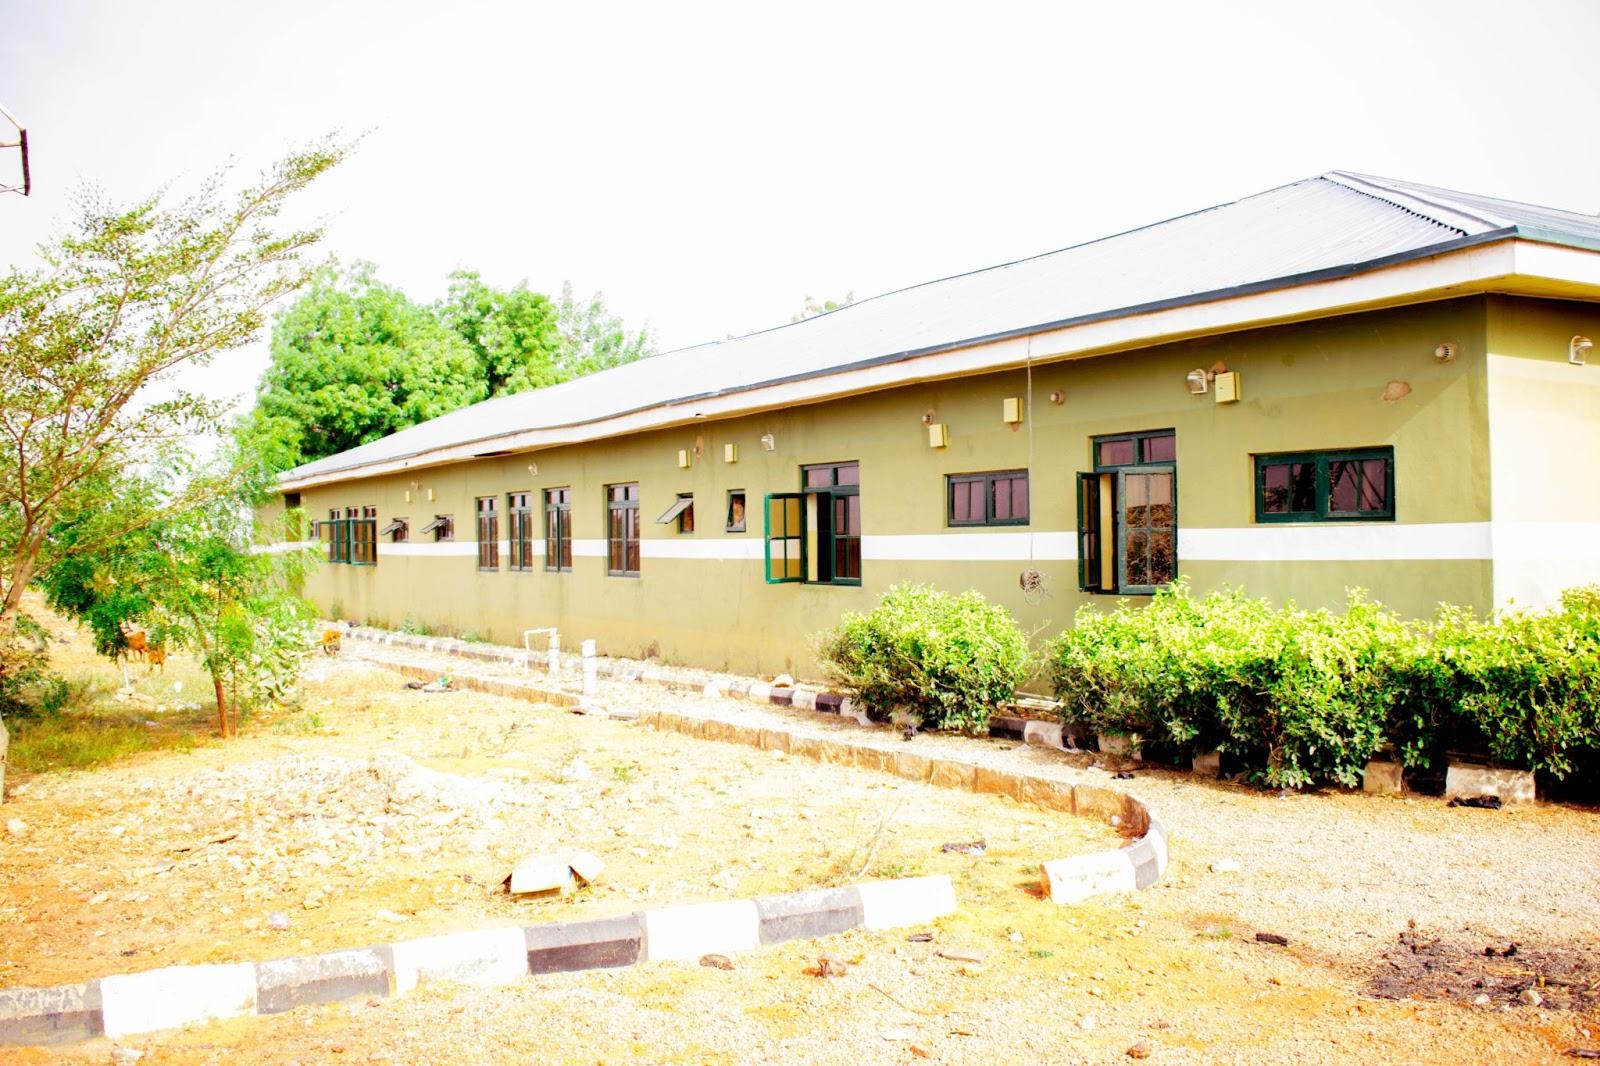 Functioning Primary Health Centre at Bashire, Tambuwal LGA, Sokoto State. Photo Credit: Qosim Suleiman